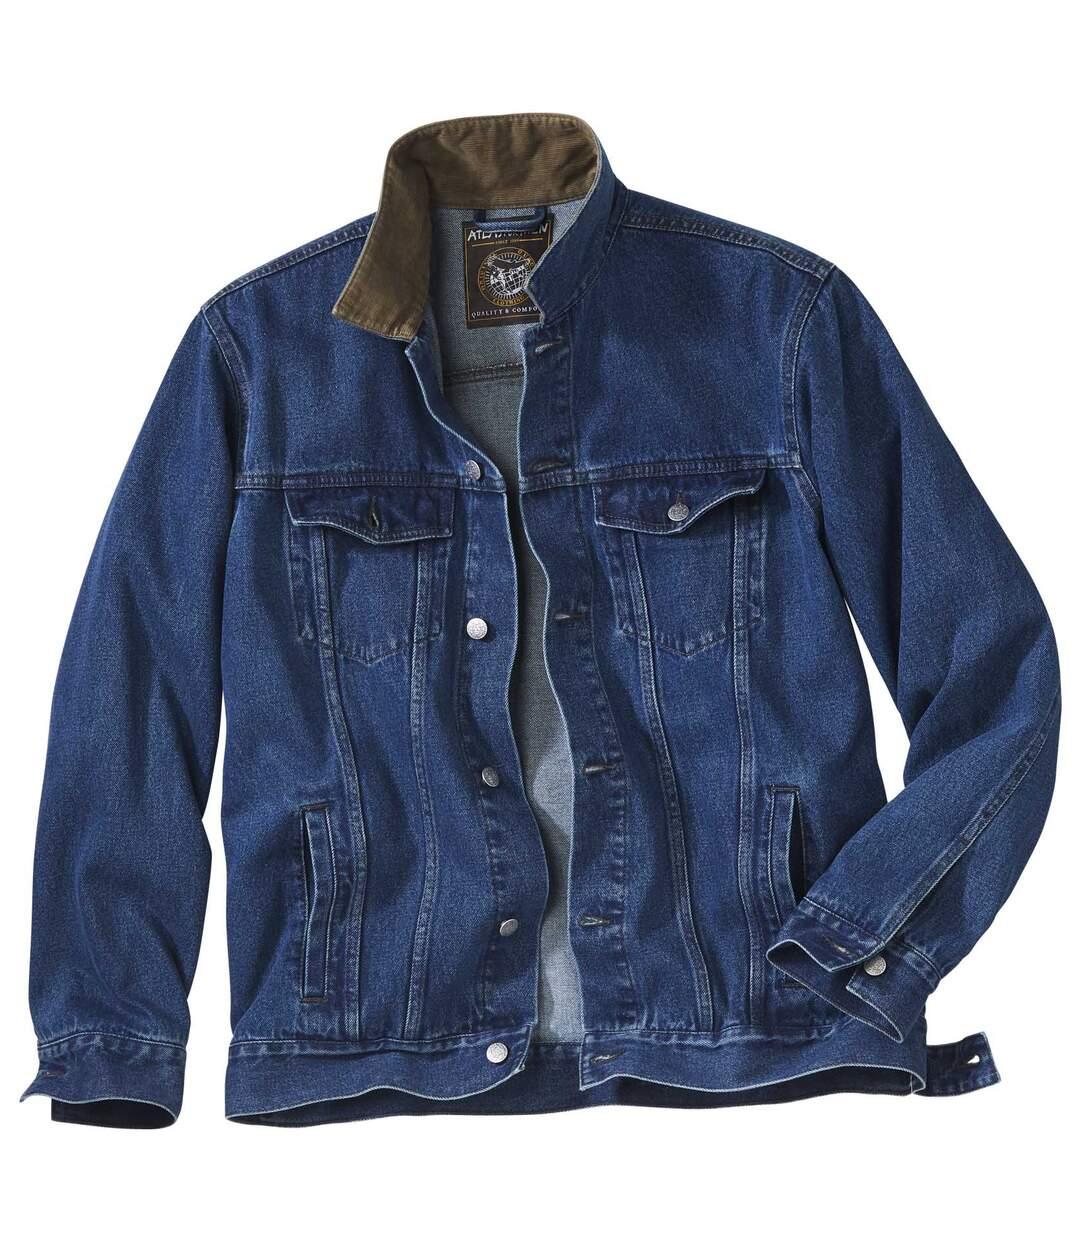 Jeansjacke mit Kordkragen